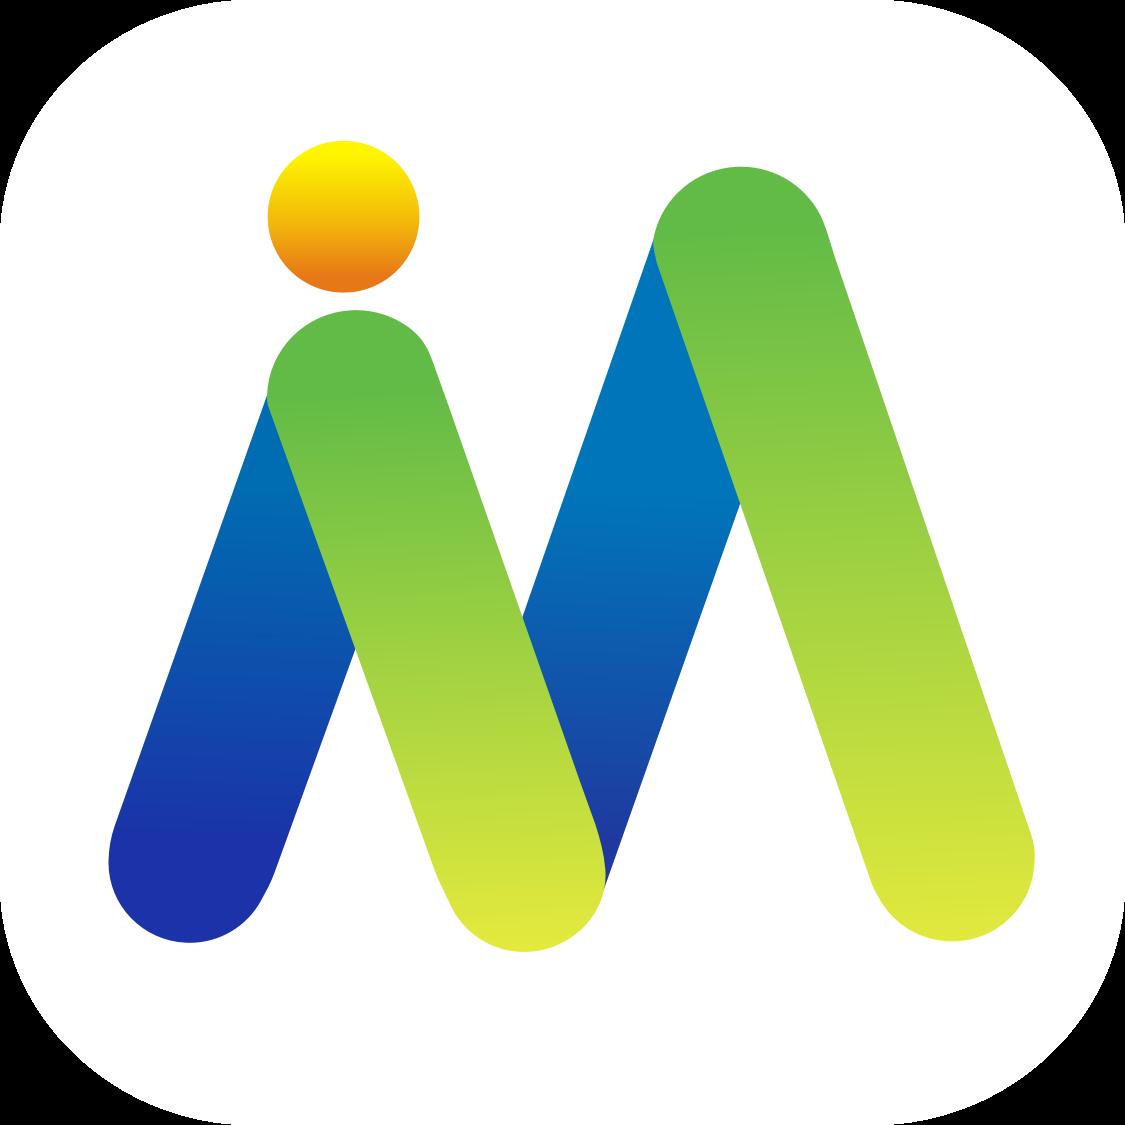 e路同行富士康app打卡官方安卓版v1.0.5官方版